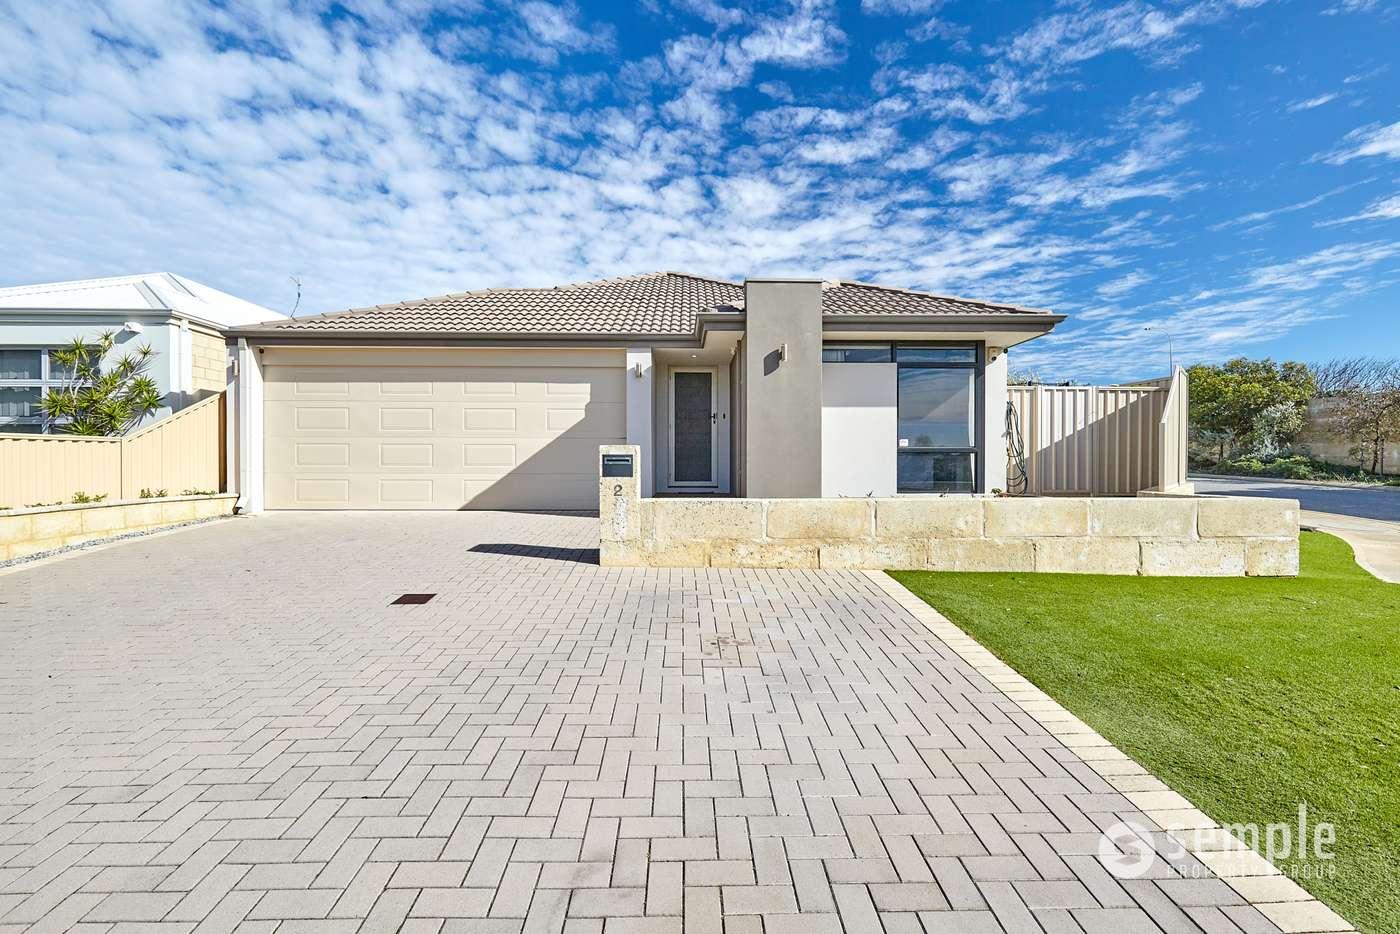 Main view of Homely house listing, 2 Desertpea Road, Beeliar WA 6164